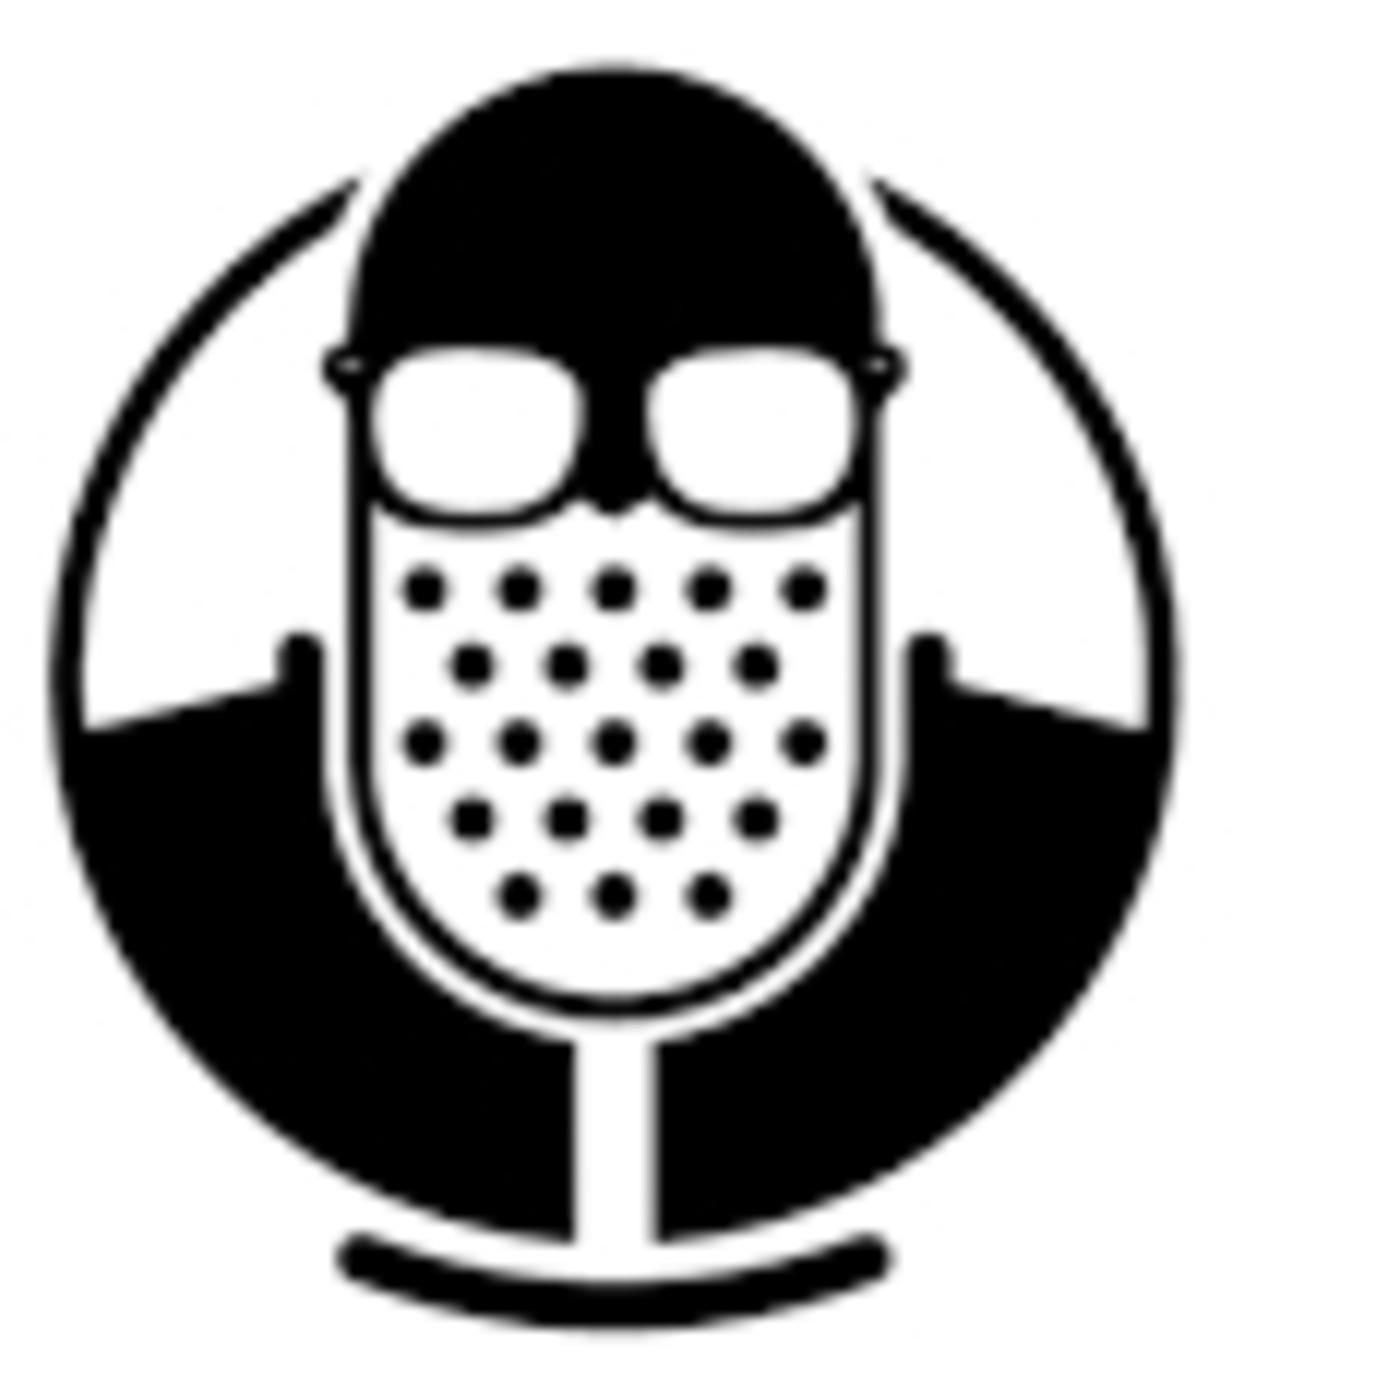 Logo de Diario del atleta